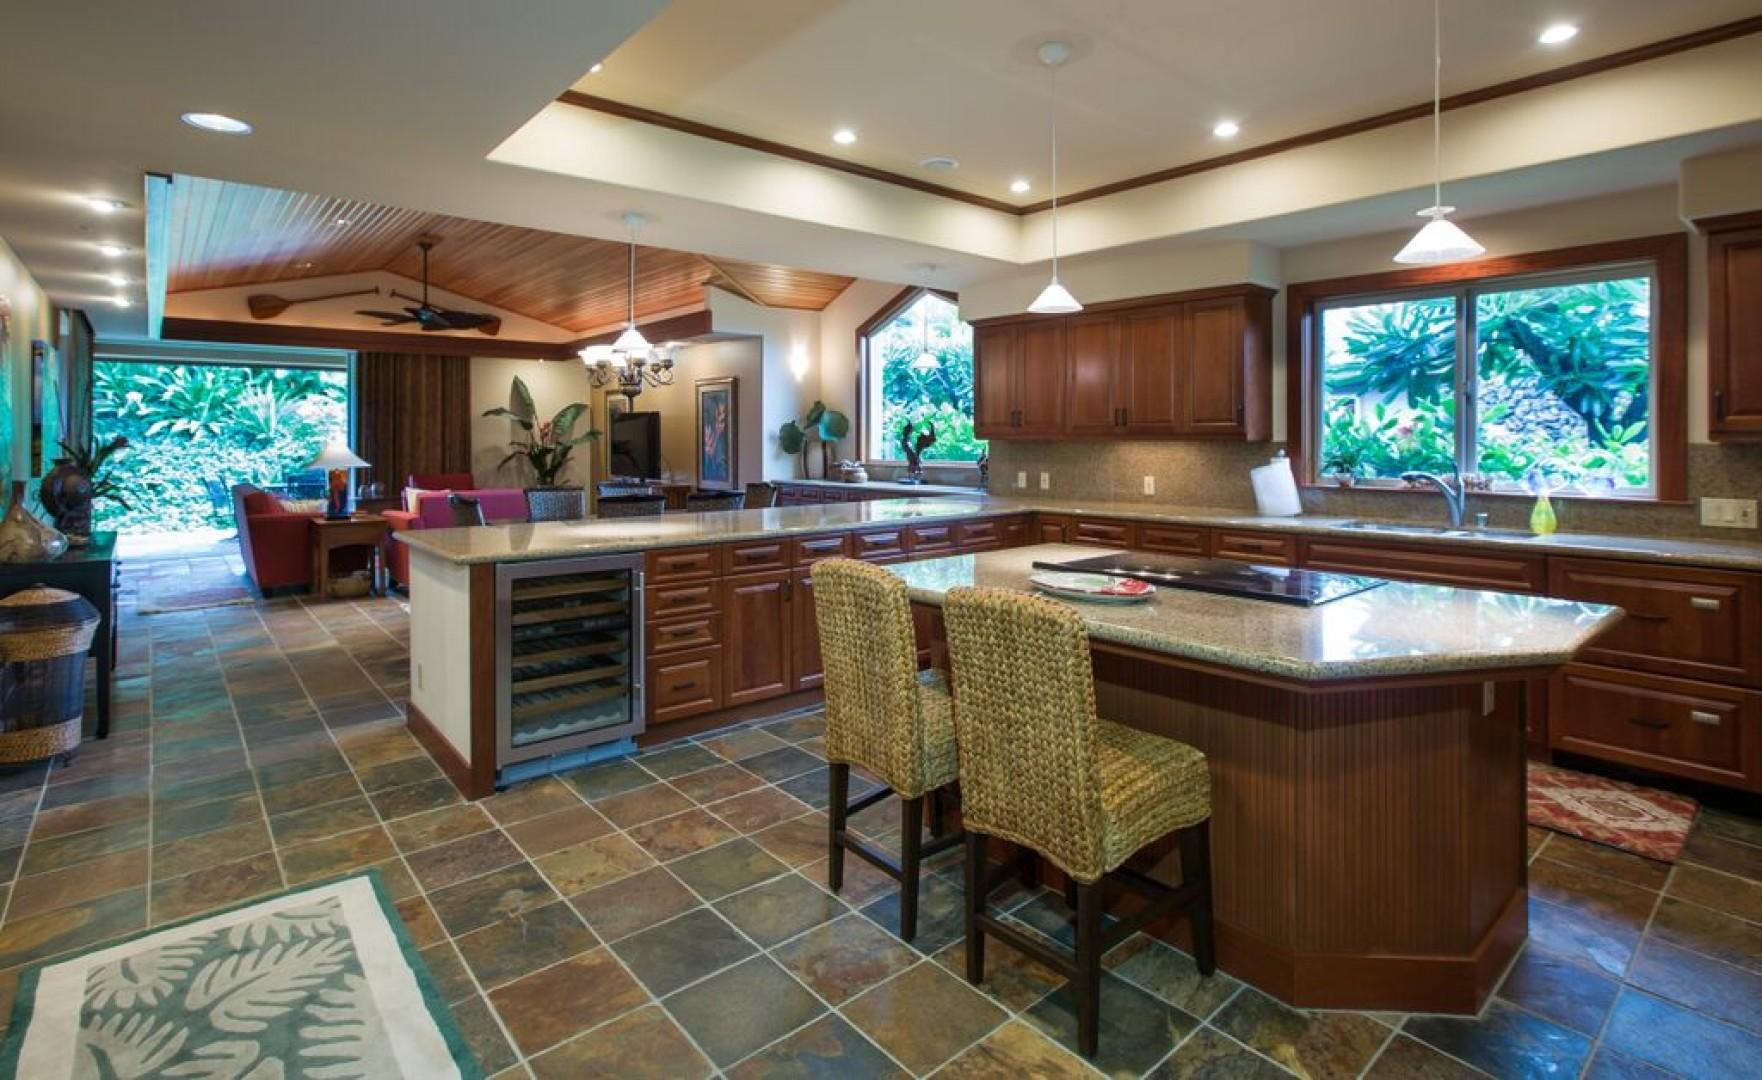 Open floor plan and vaulted ceilings